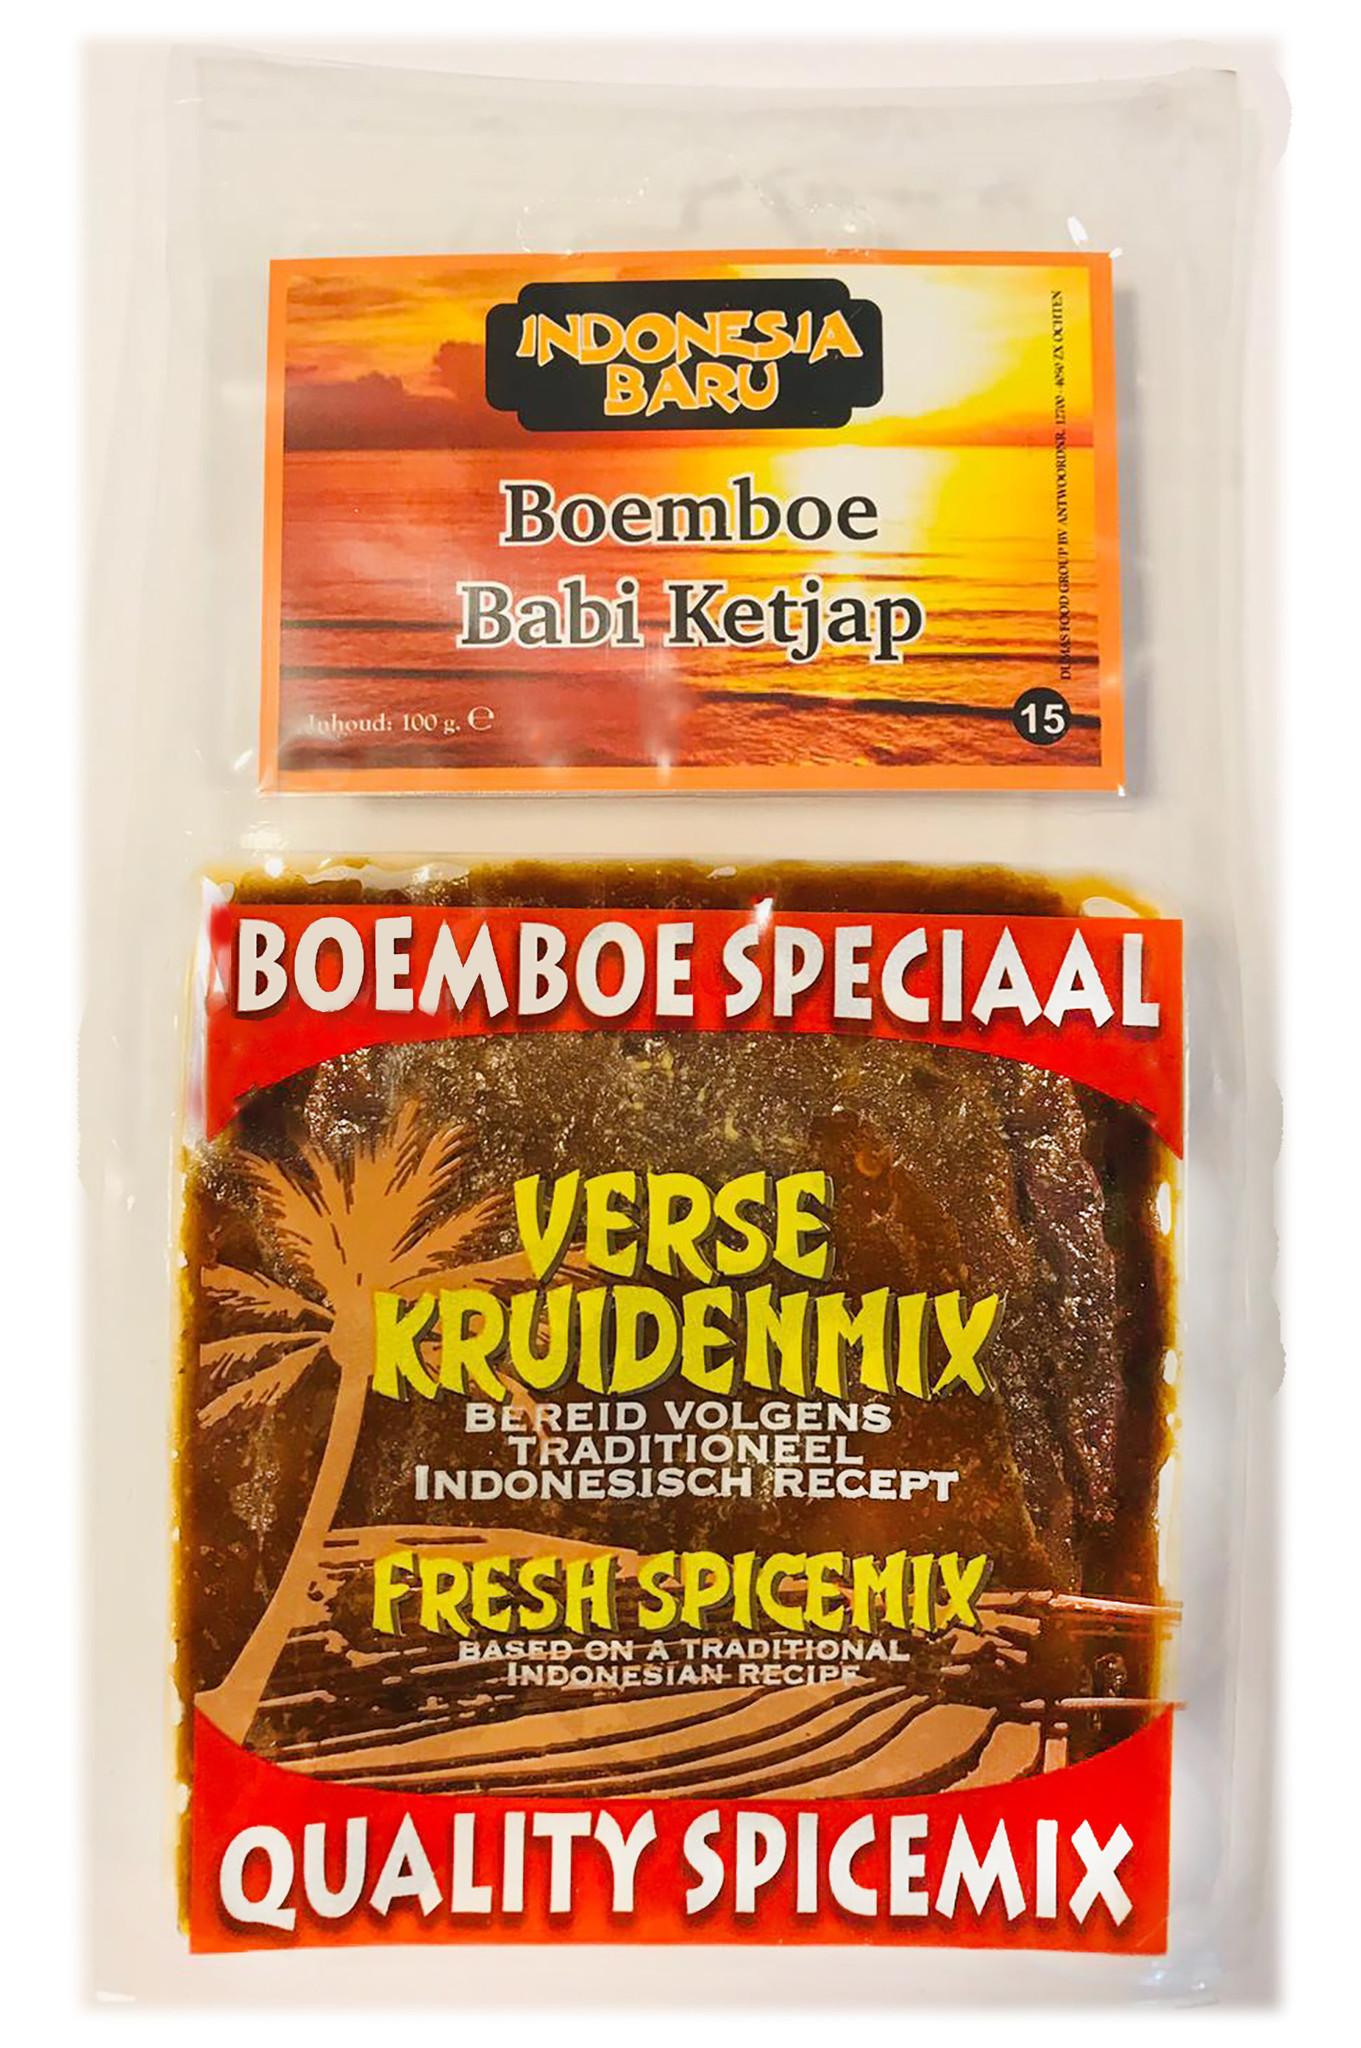 Boemboes